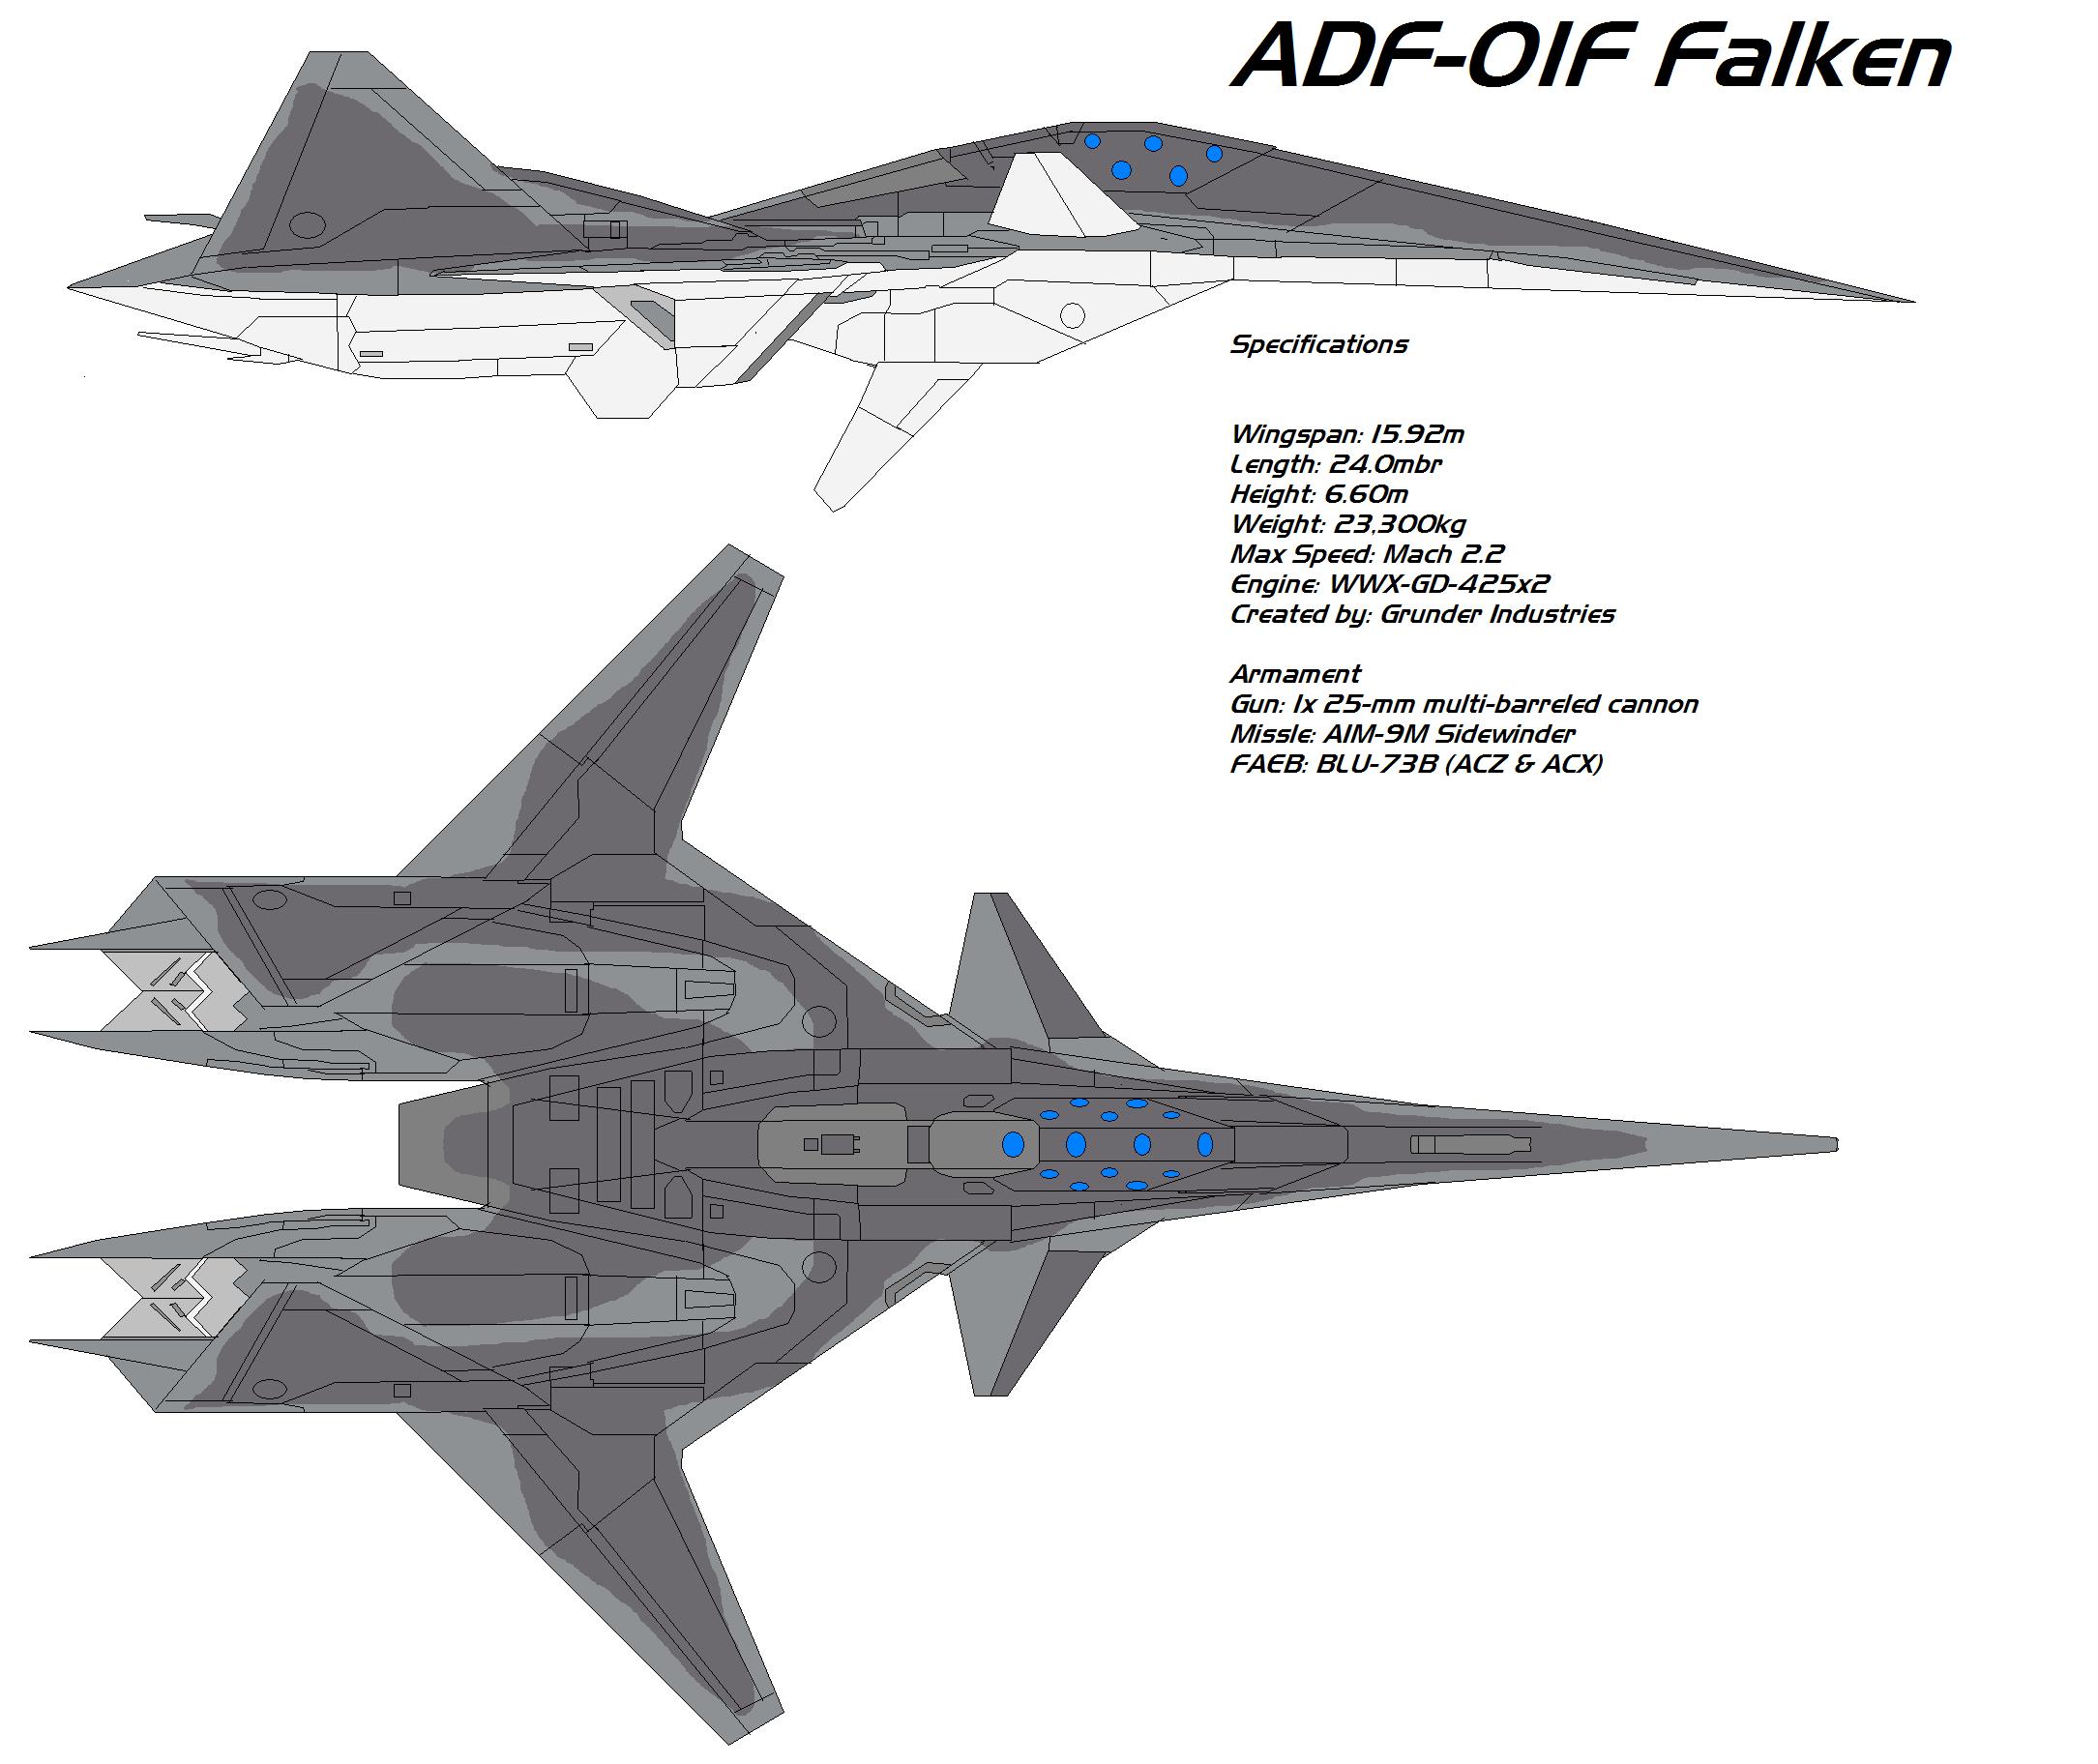 ADF-01F Falken by bagera3005